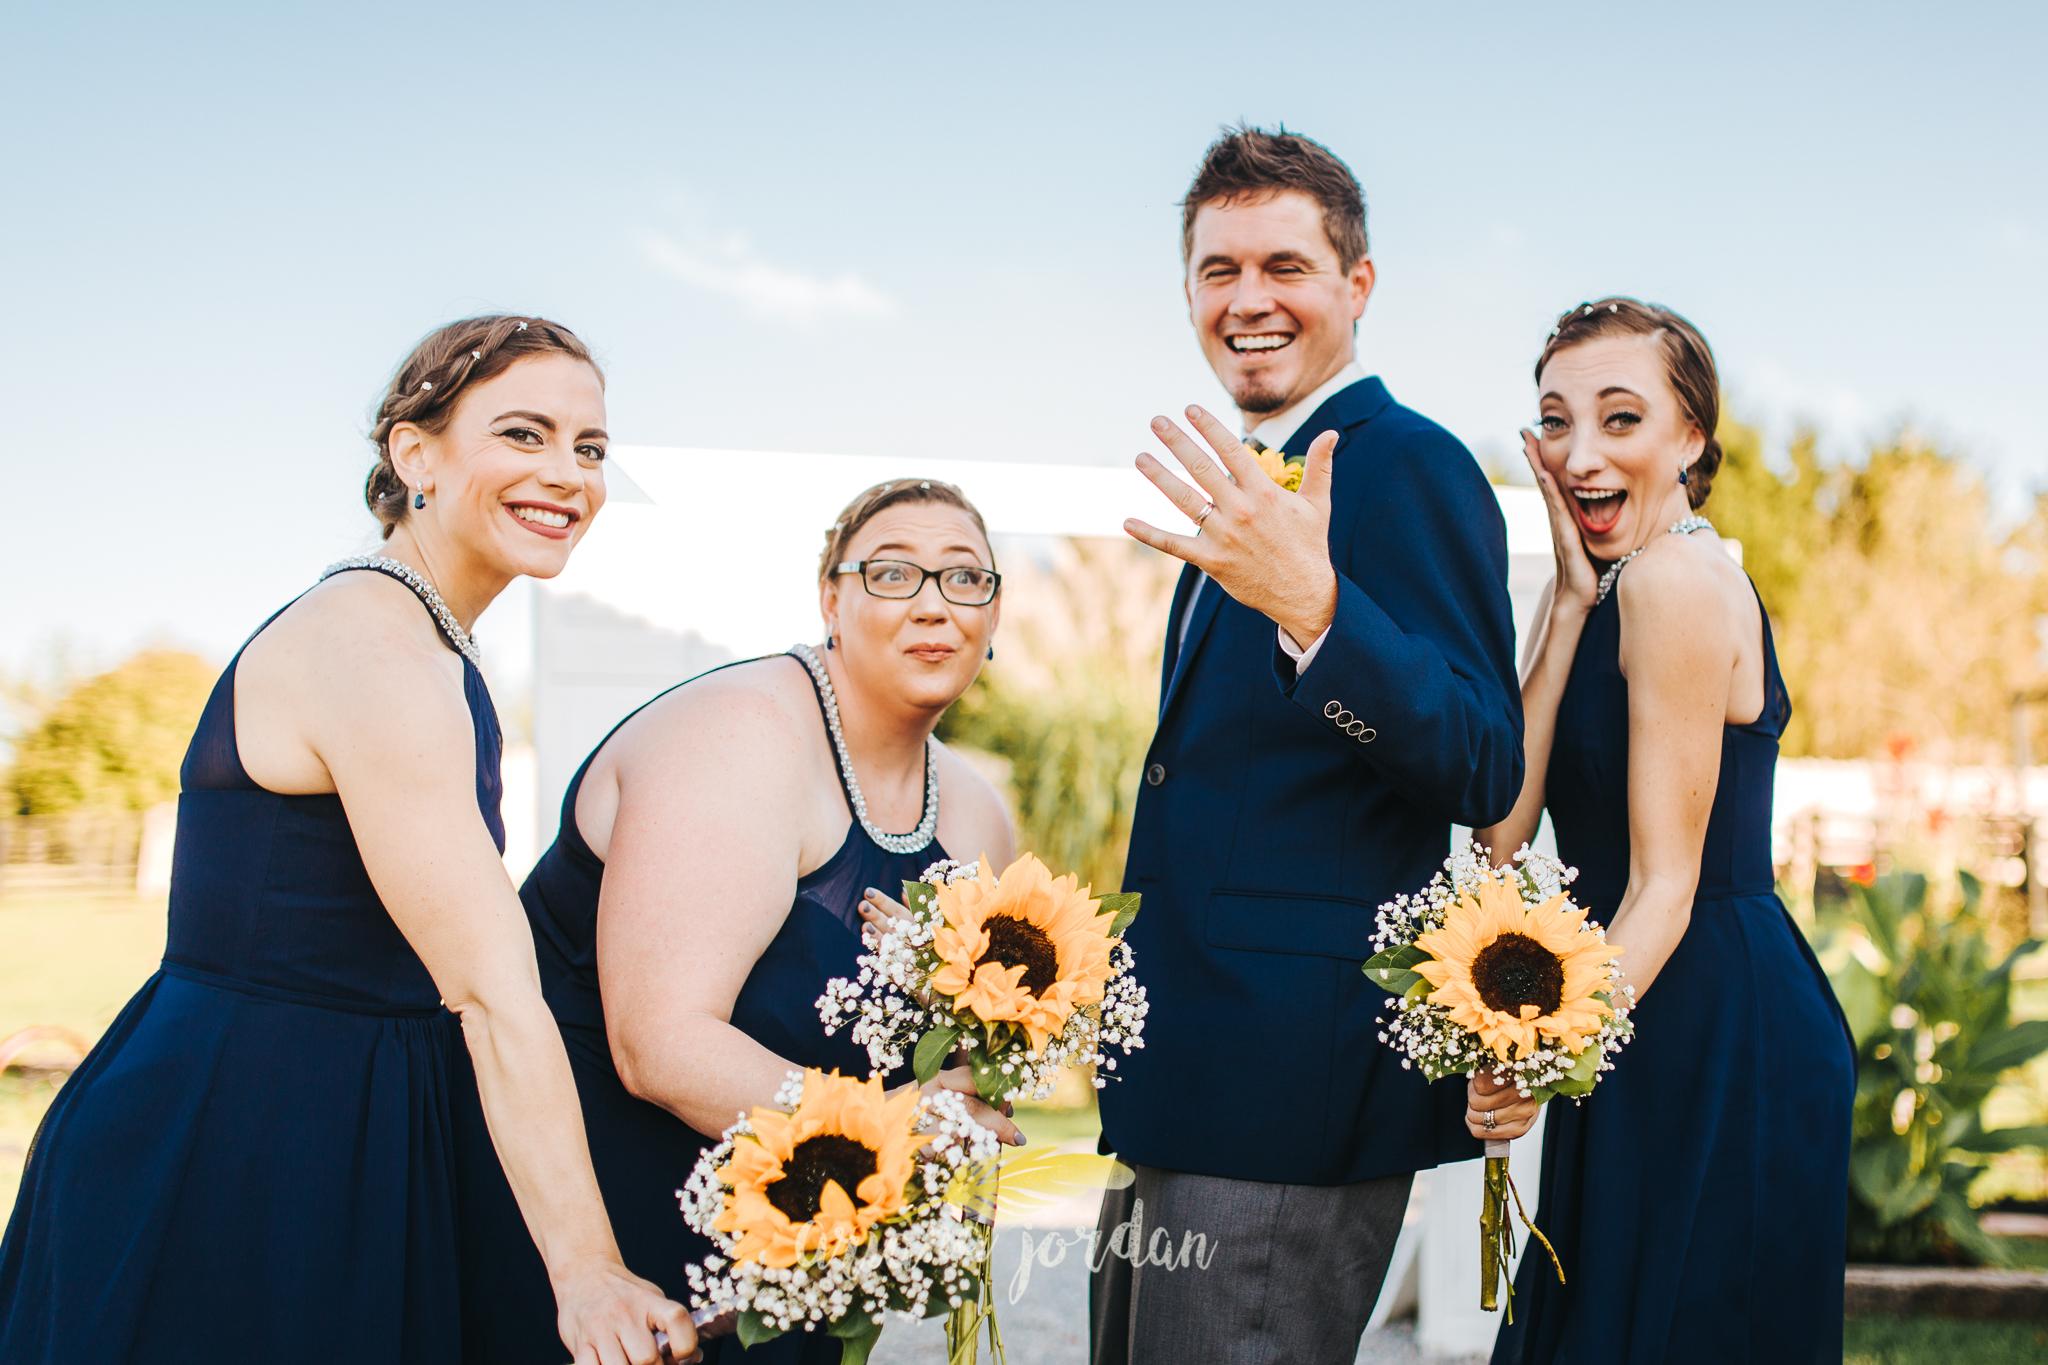 095 Ariana Jordan Photography -Moonlight Fields Lexington Ky Wedding Photographer 1883.jpg